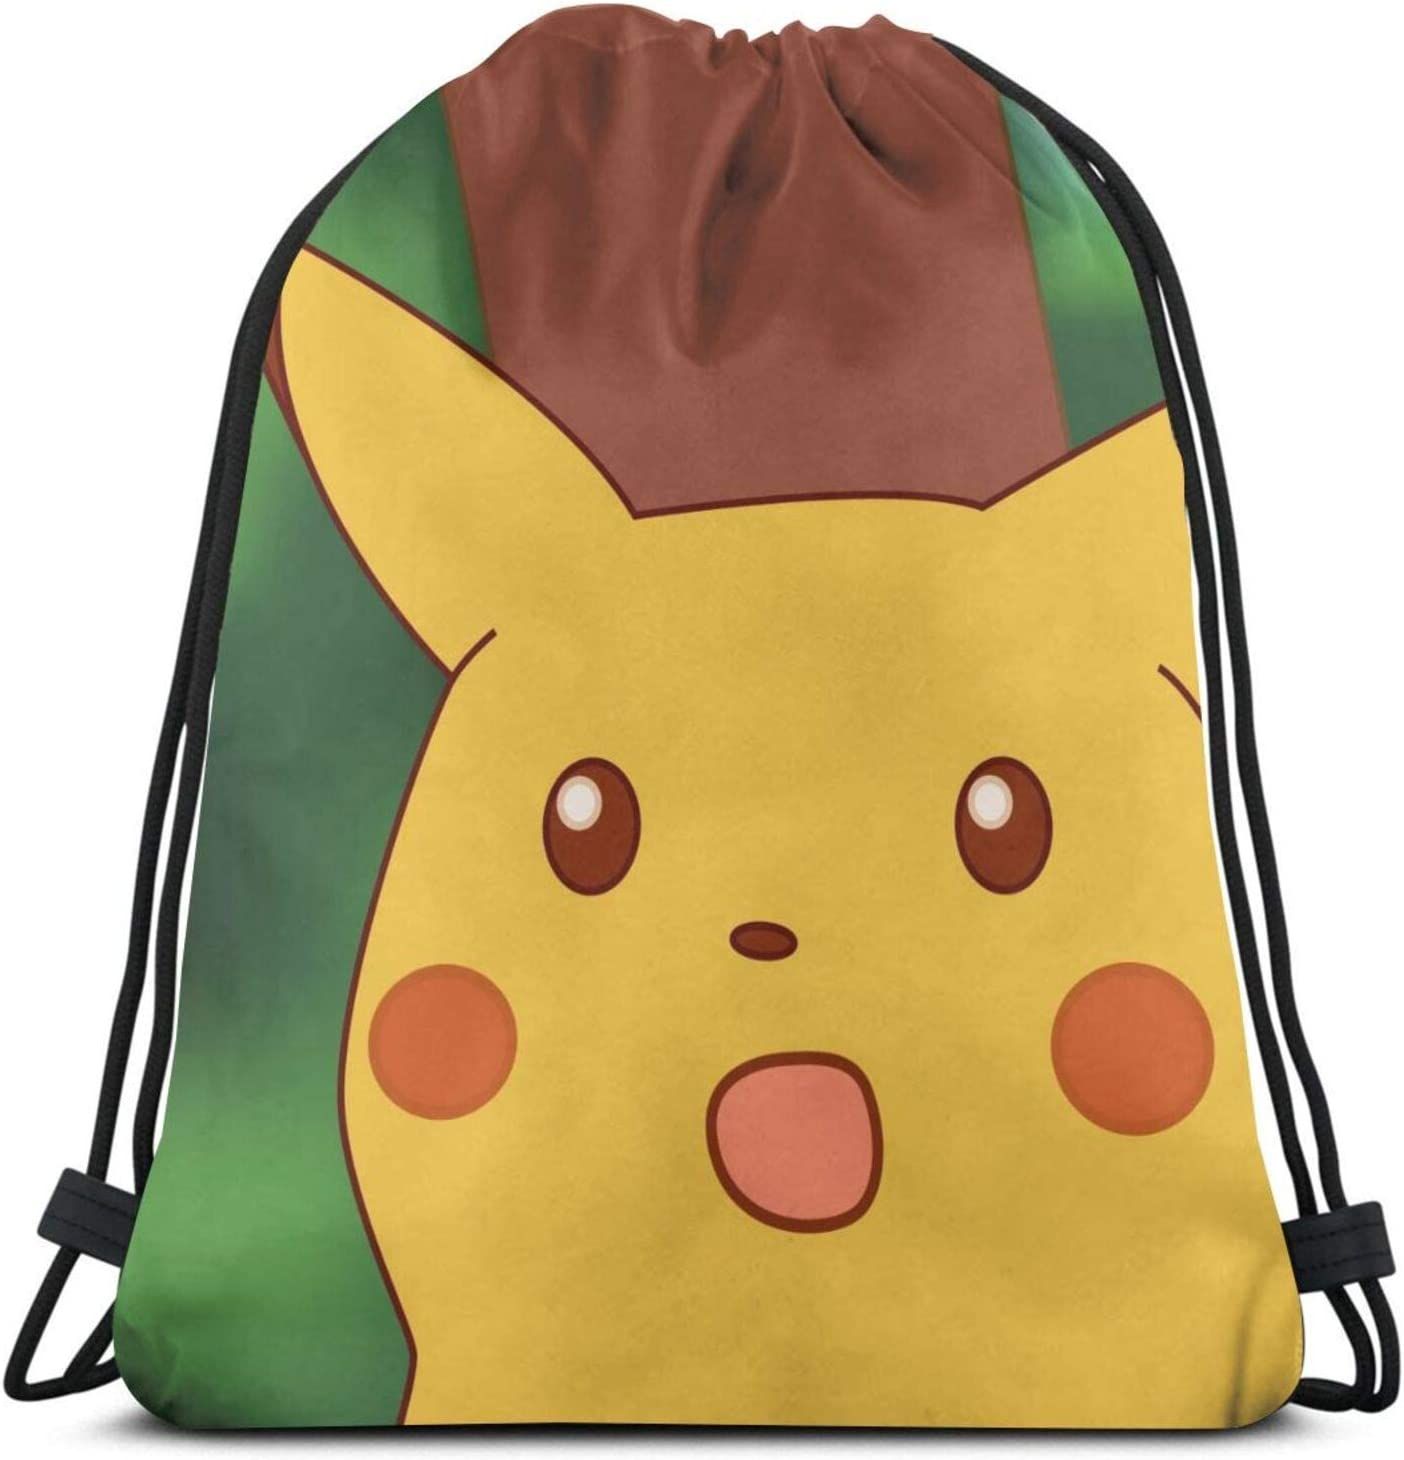 Drawstring Backpack Pink Pig Faces Rucksack